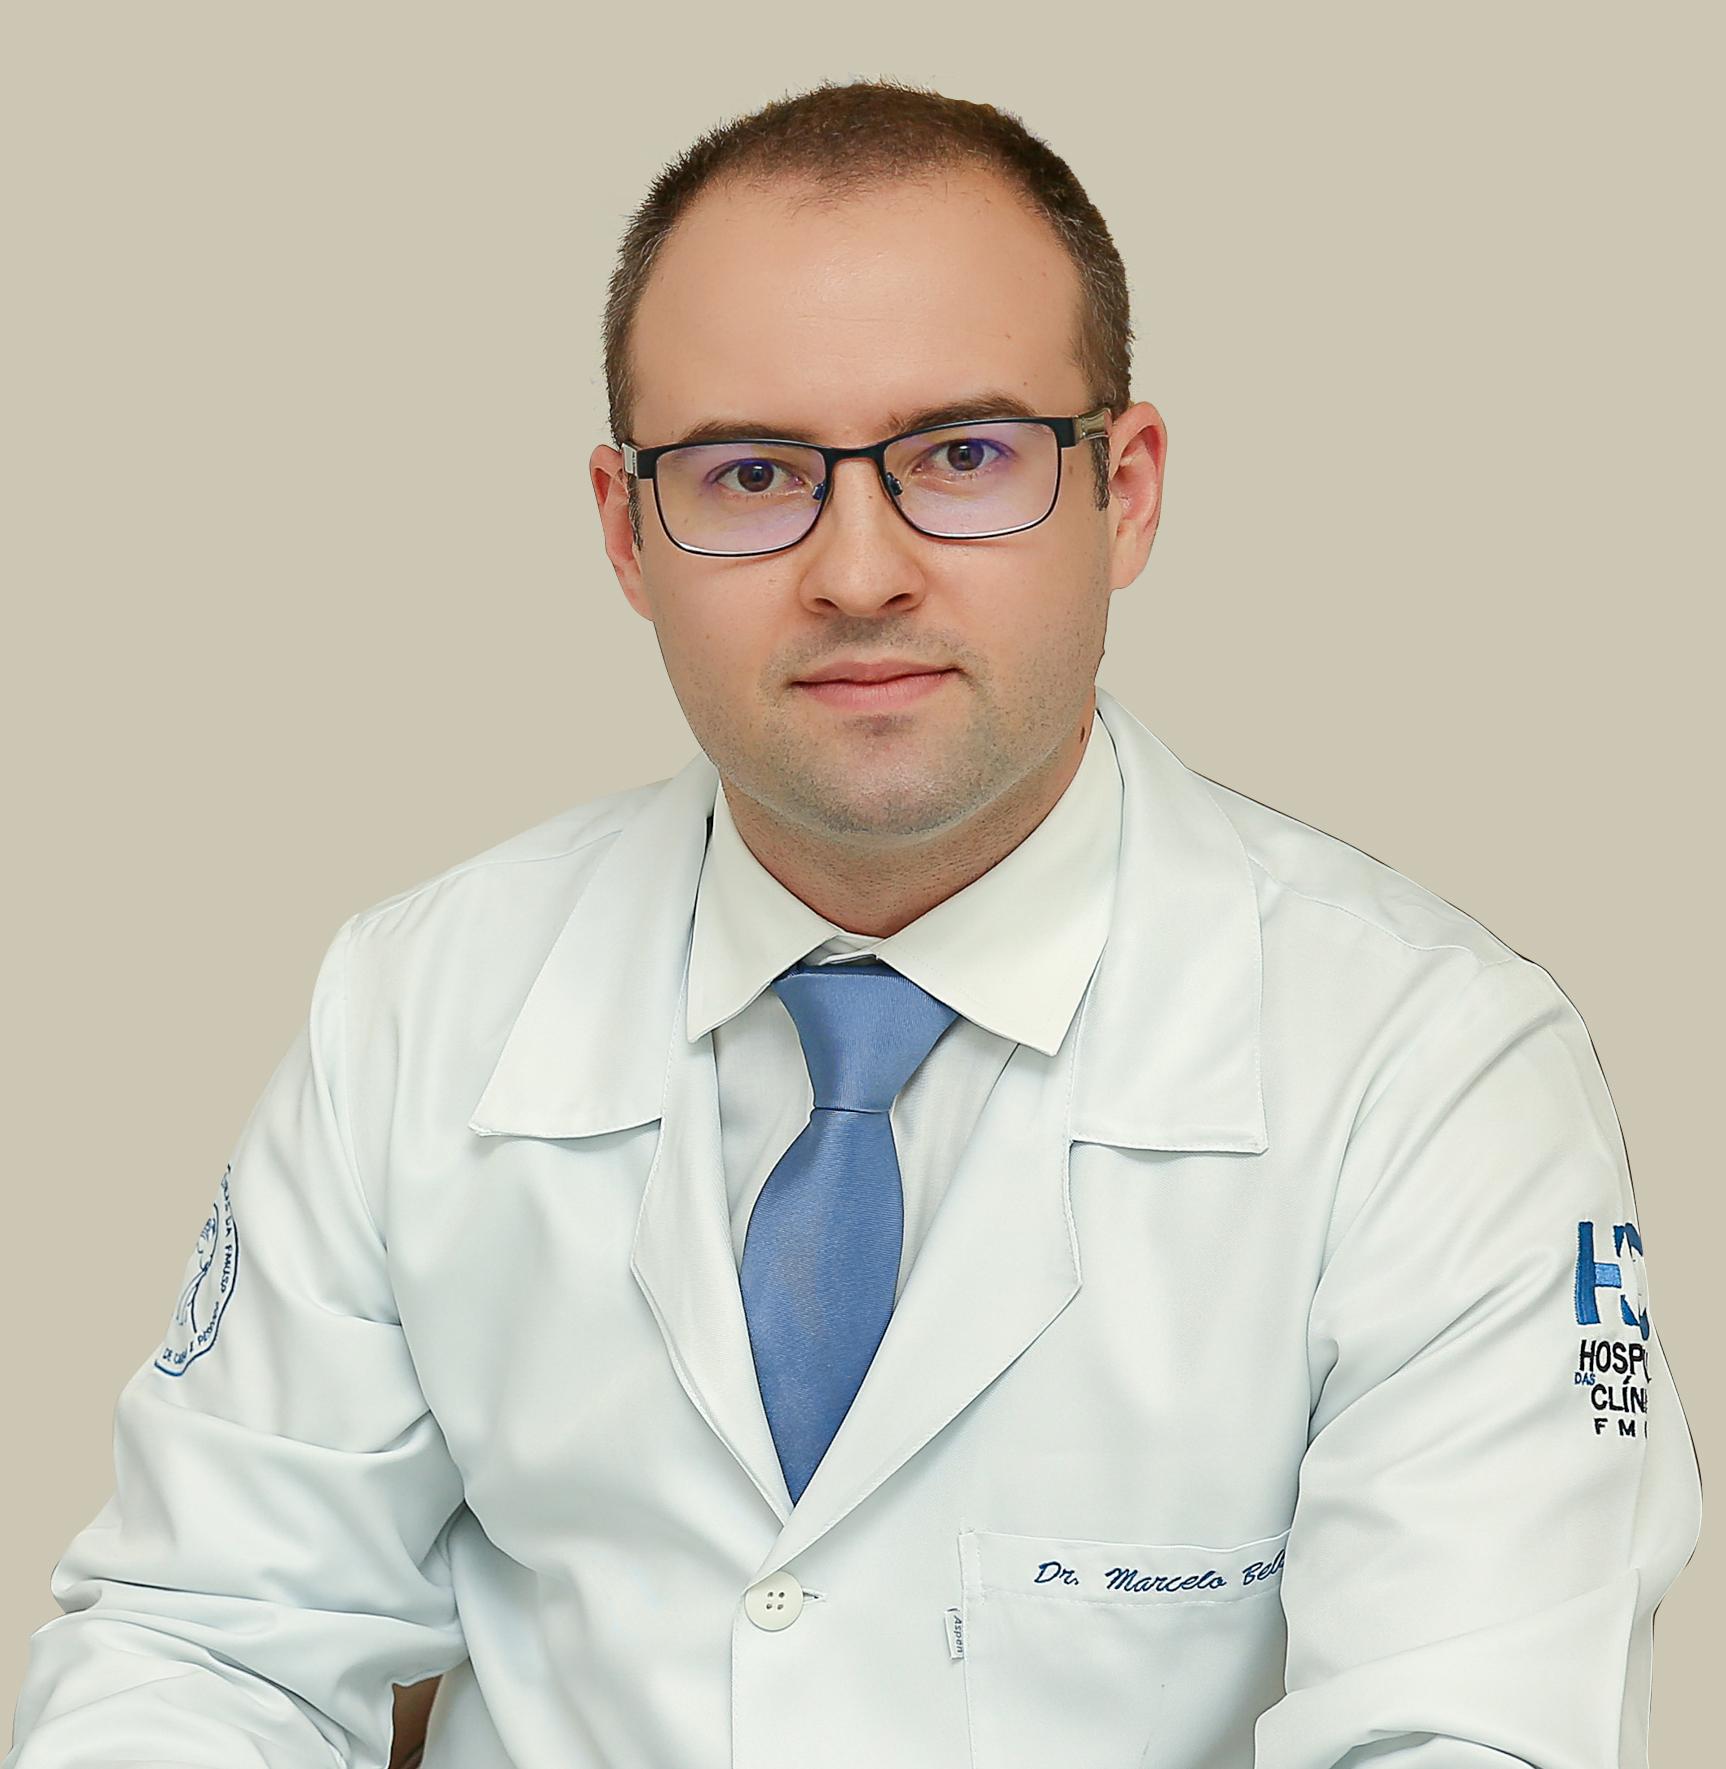 Dr. Marcelo Belli